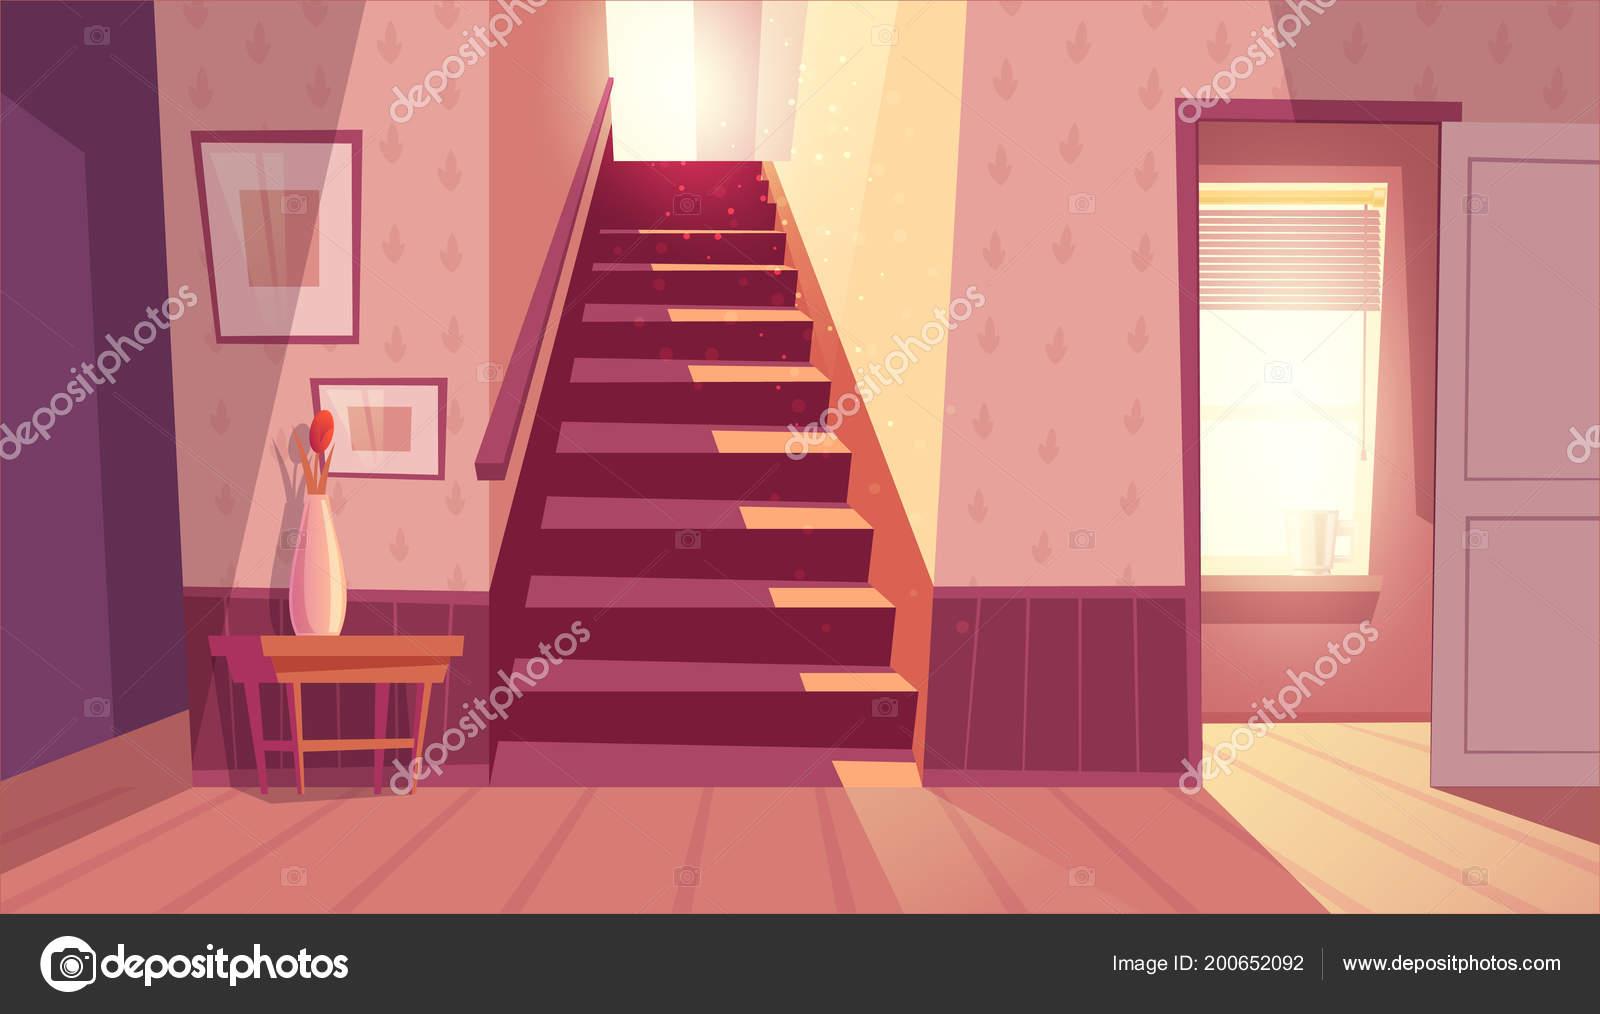 Vector interieur met trap trap in huis u stockvector